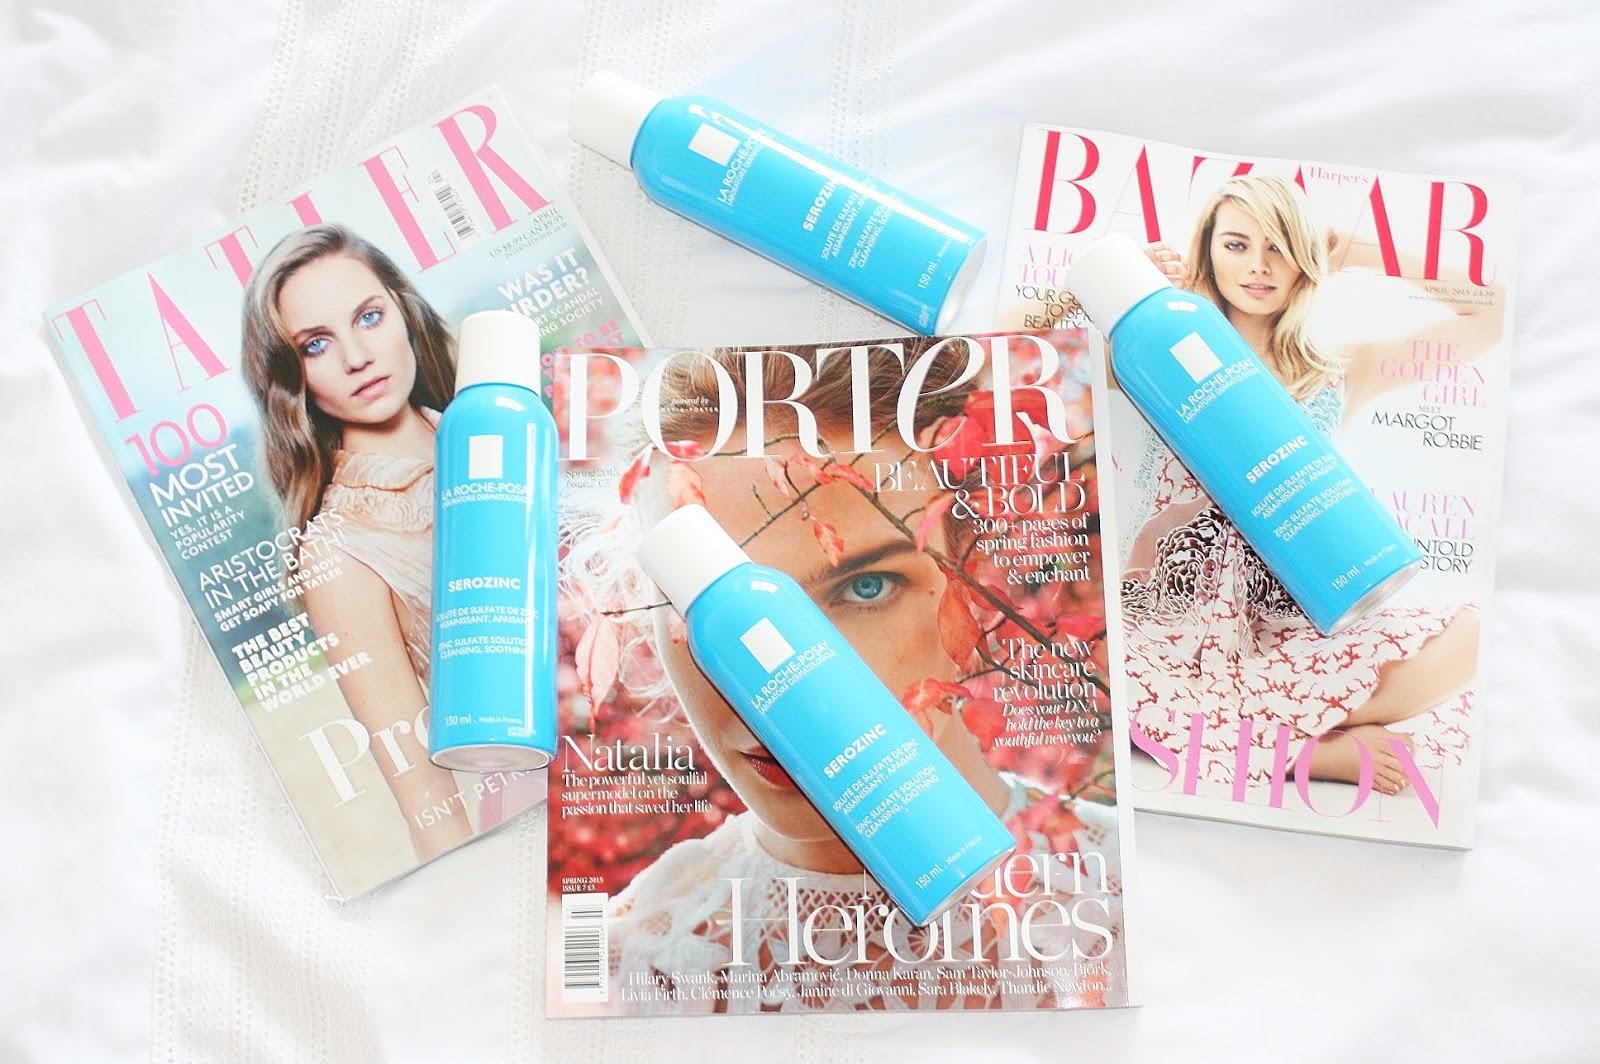 Katherine Penney Chic Beauty Skincare La Roche Posay Serozinc Toner Magazines Paris